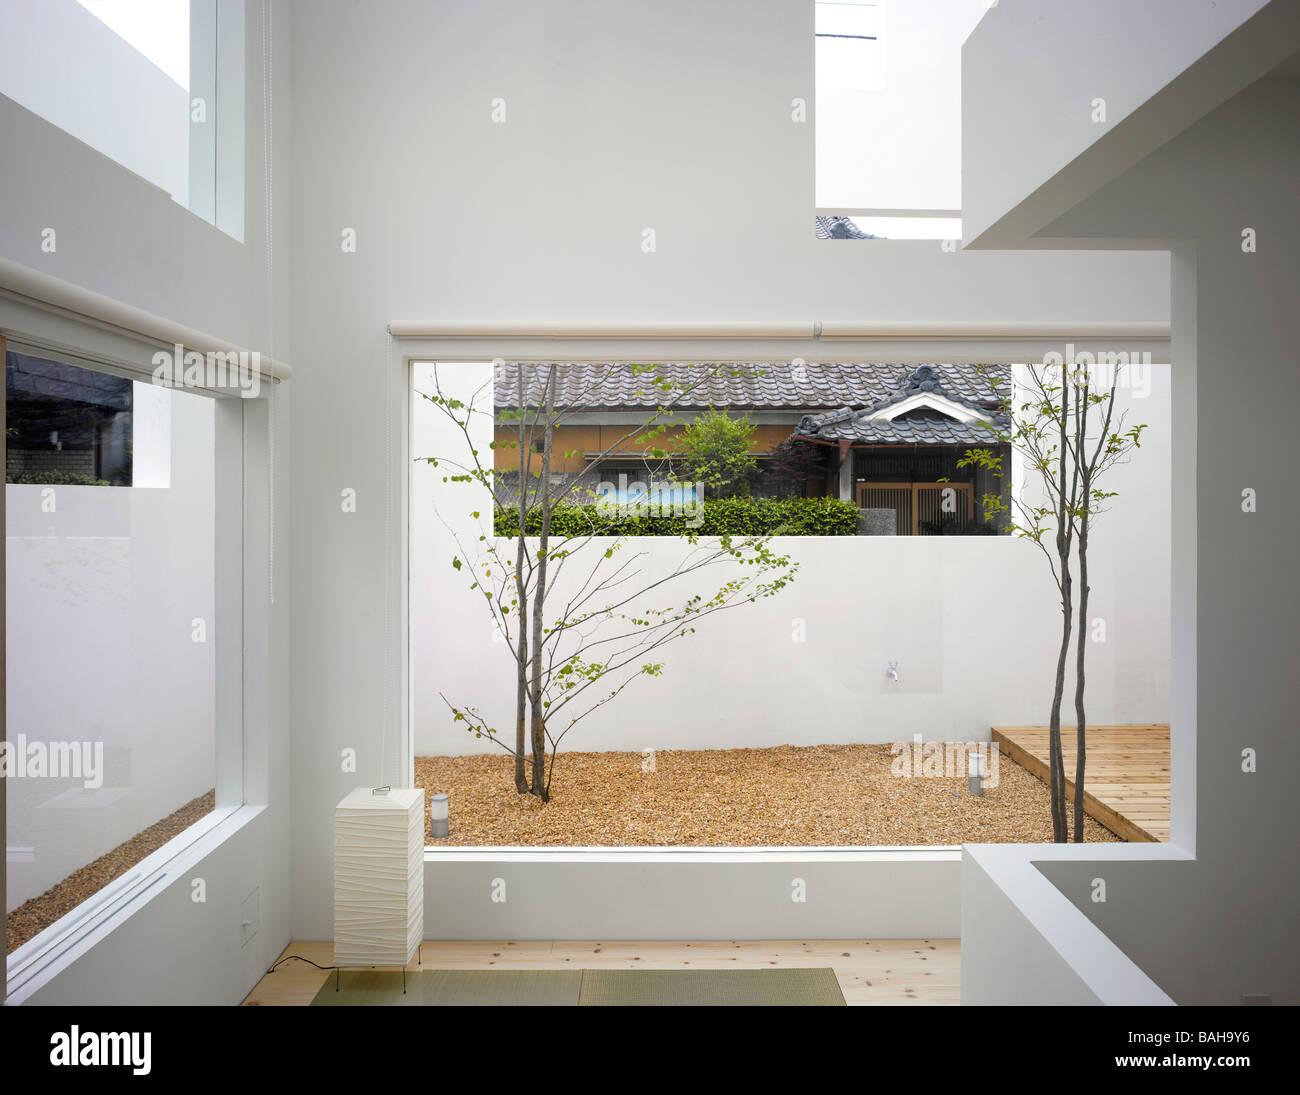 N HOUSE, SOU FUJIMOTO ARCHITECTS, OITA, JAPAN Stock Photo: 23737930 ...